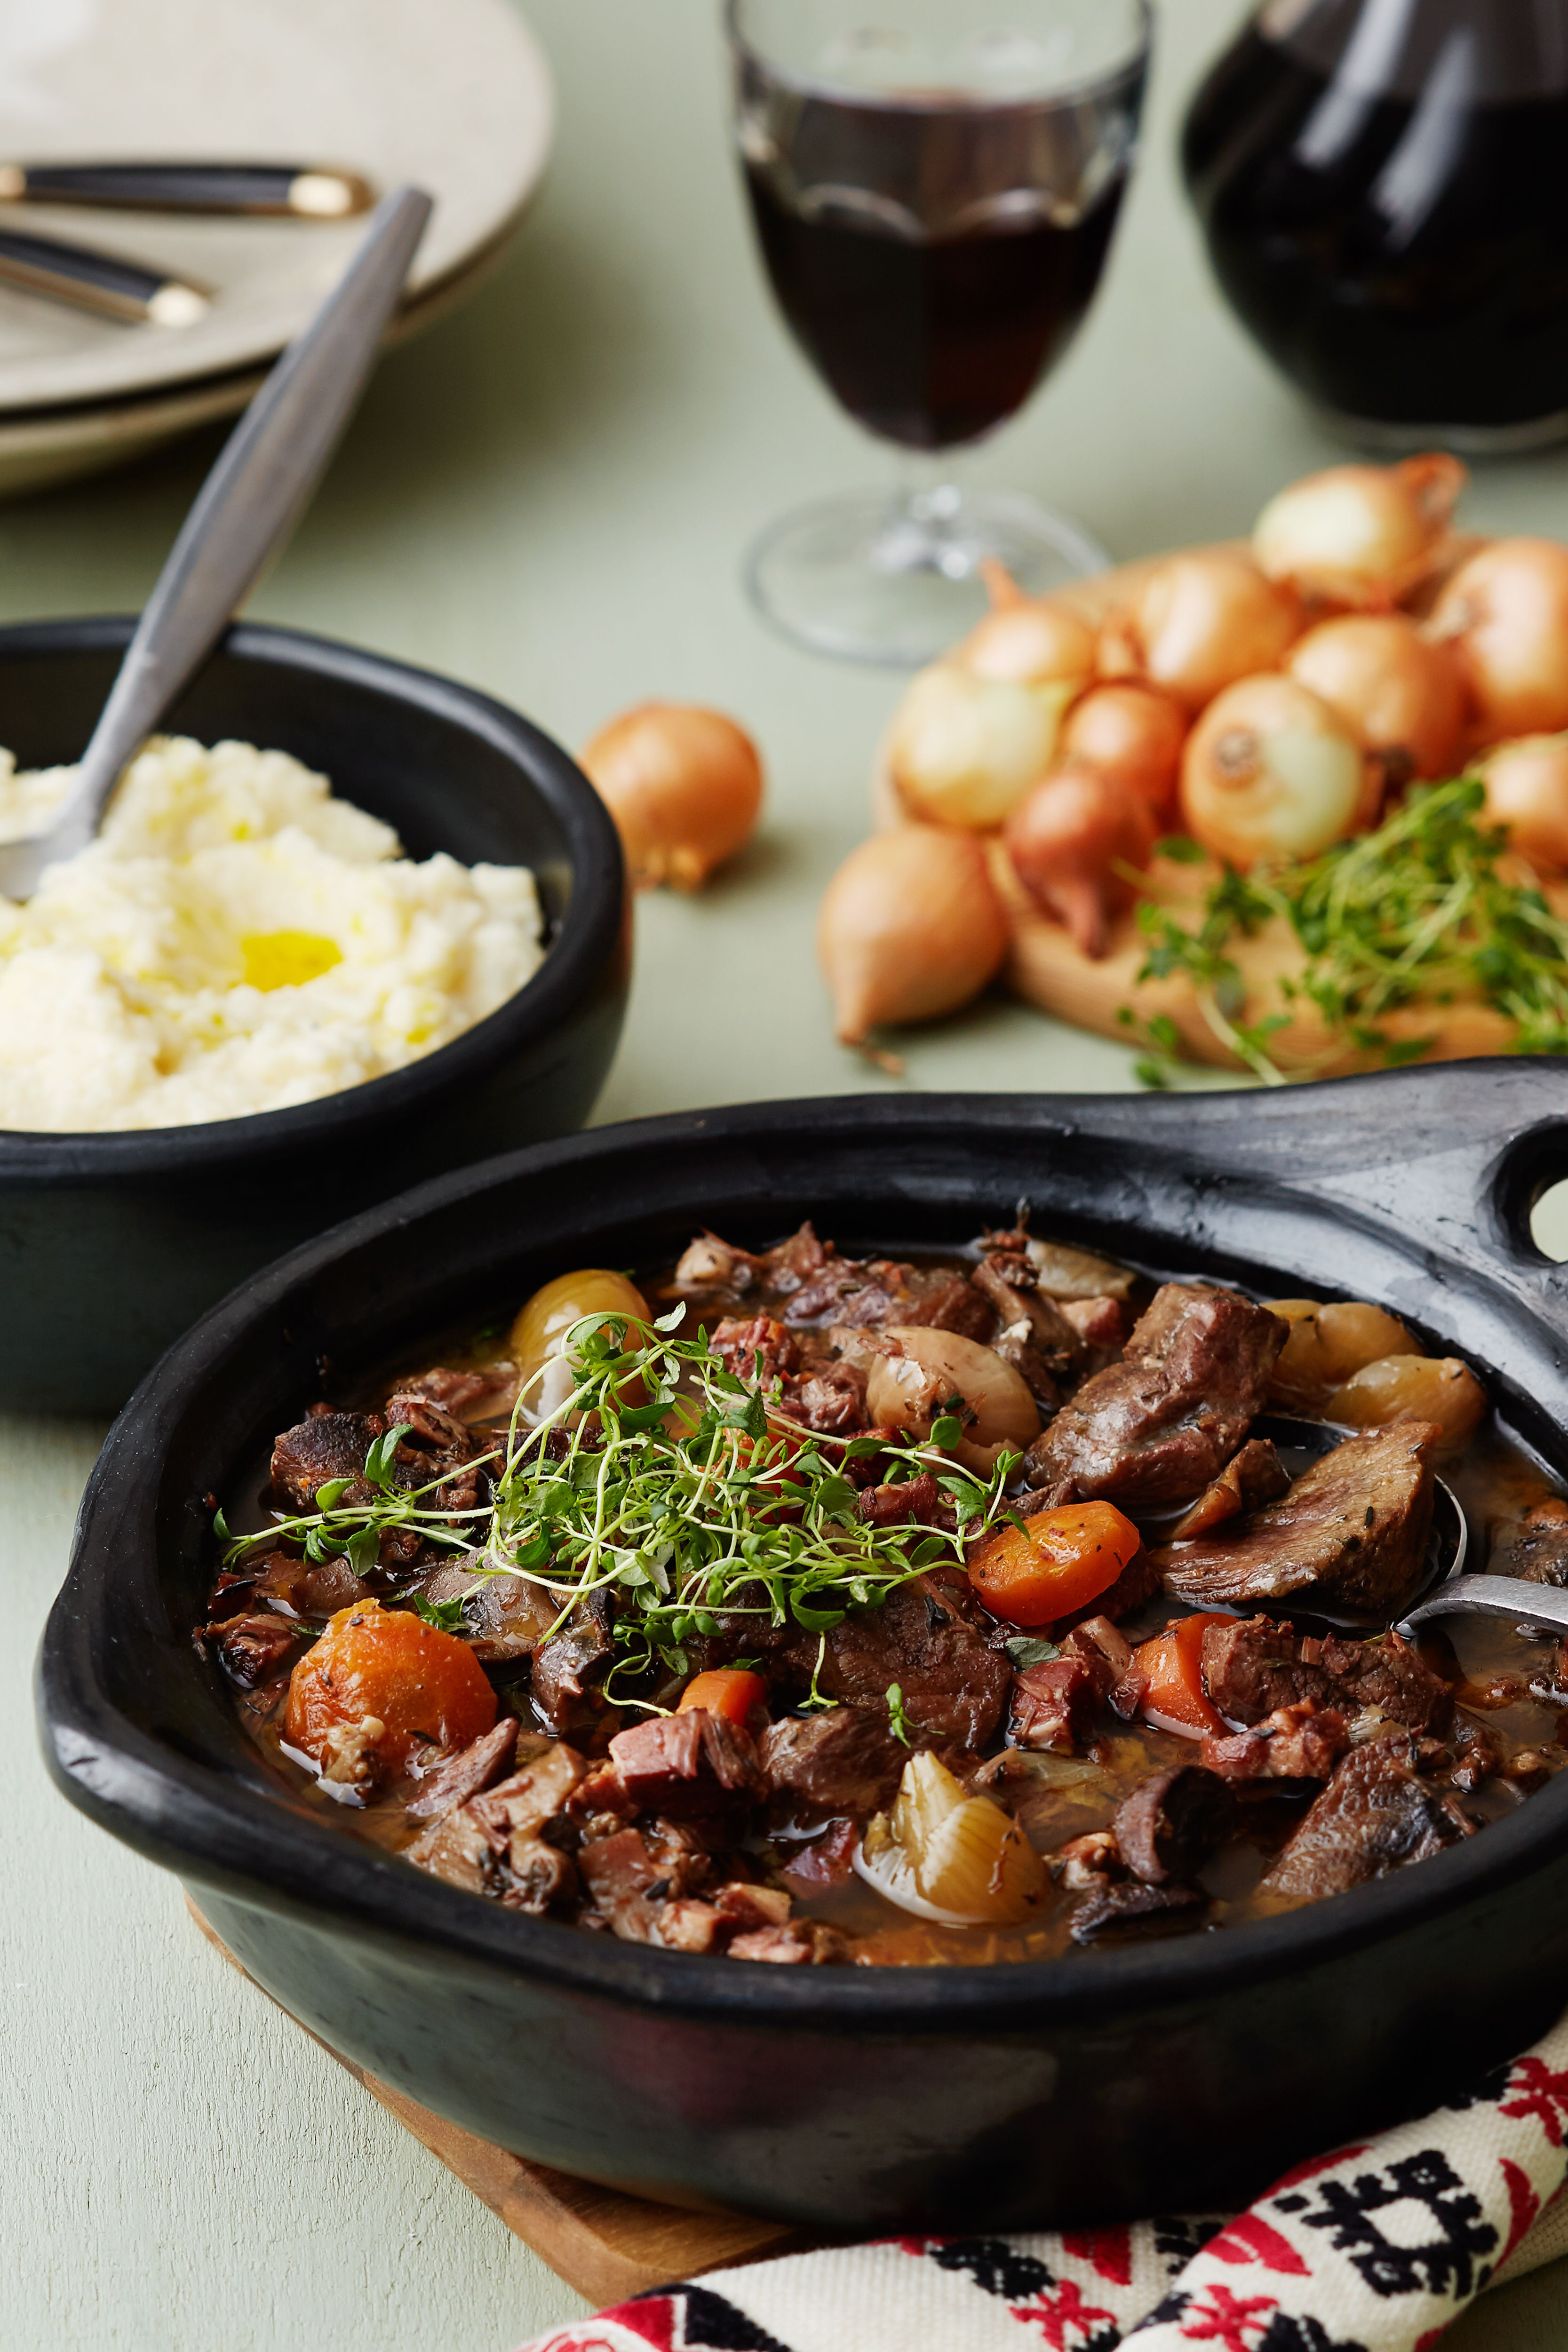 boeuf bourguignon kött